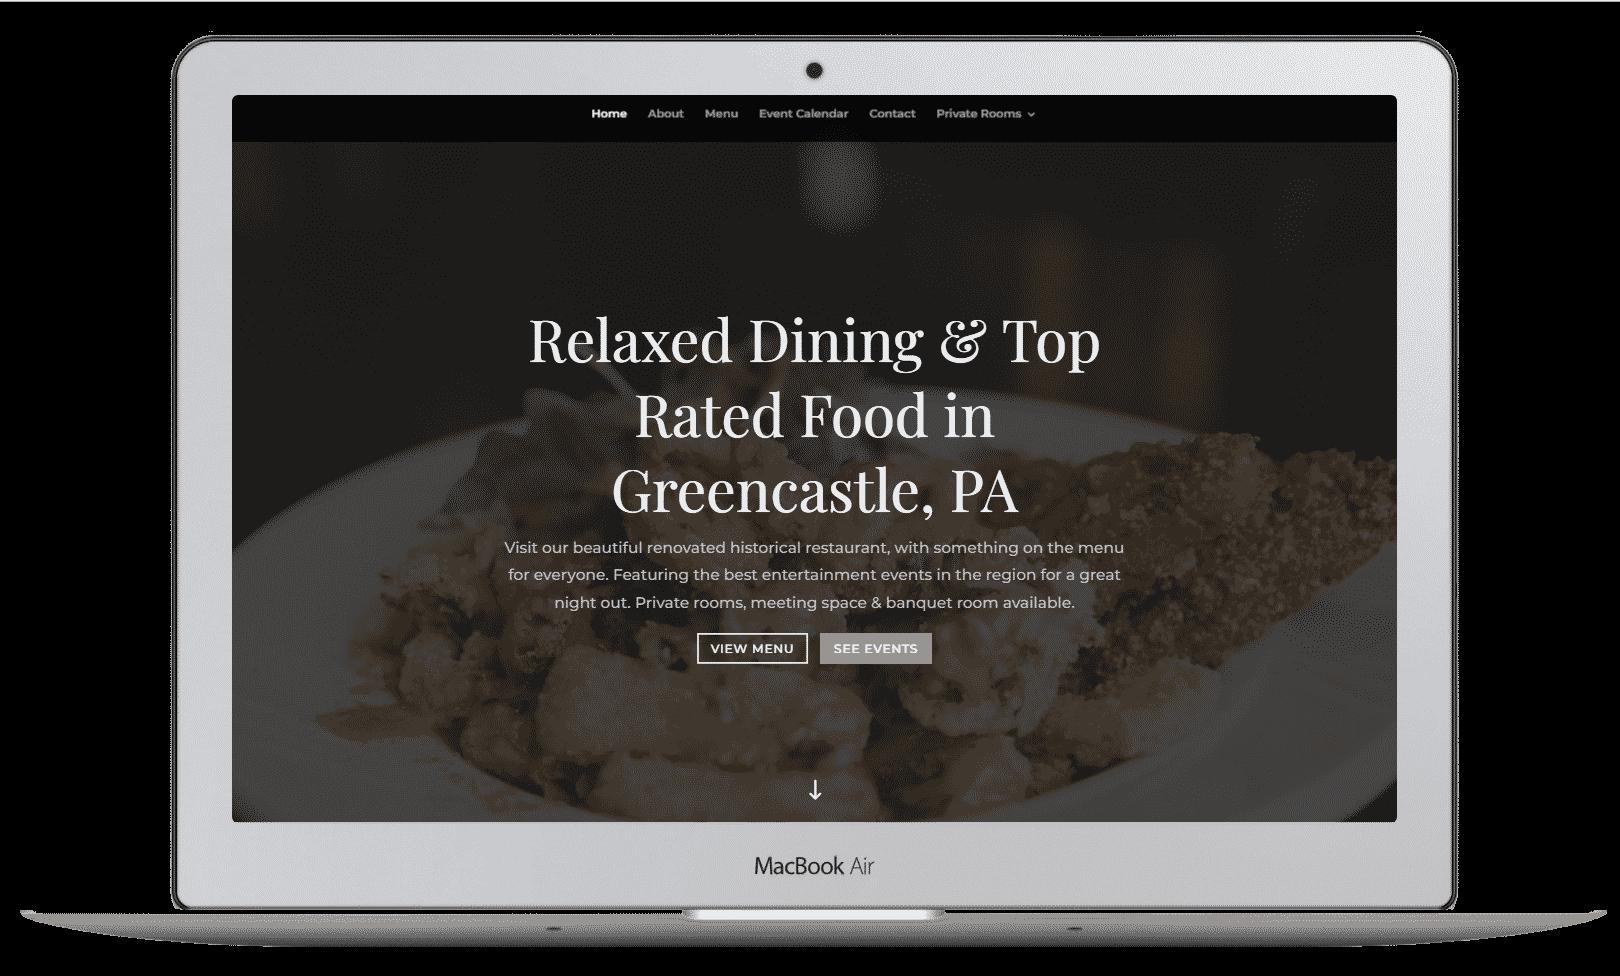 Website Design - LaunchUX